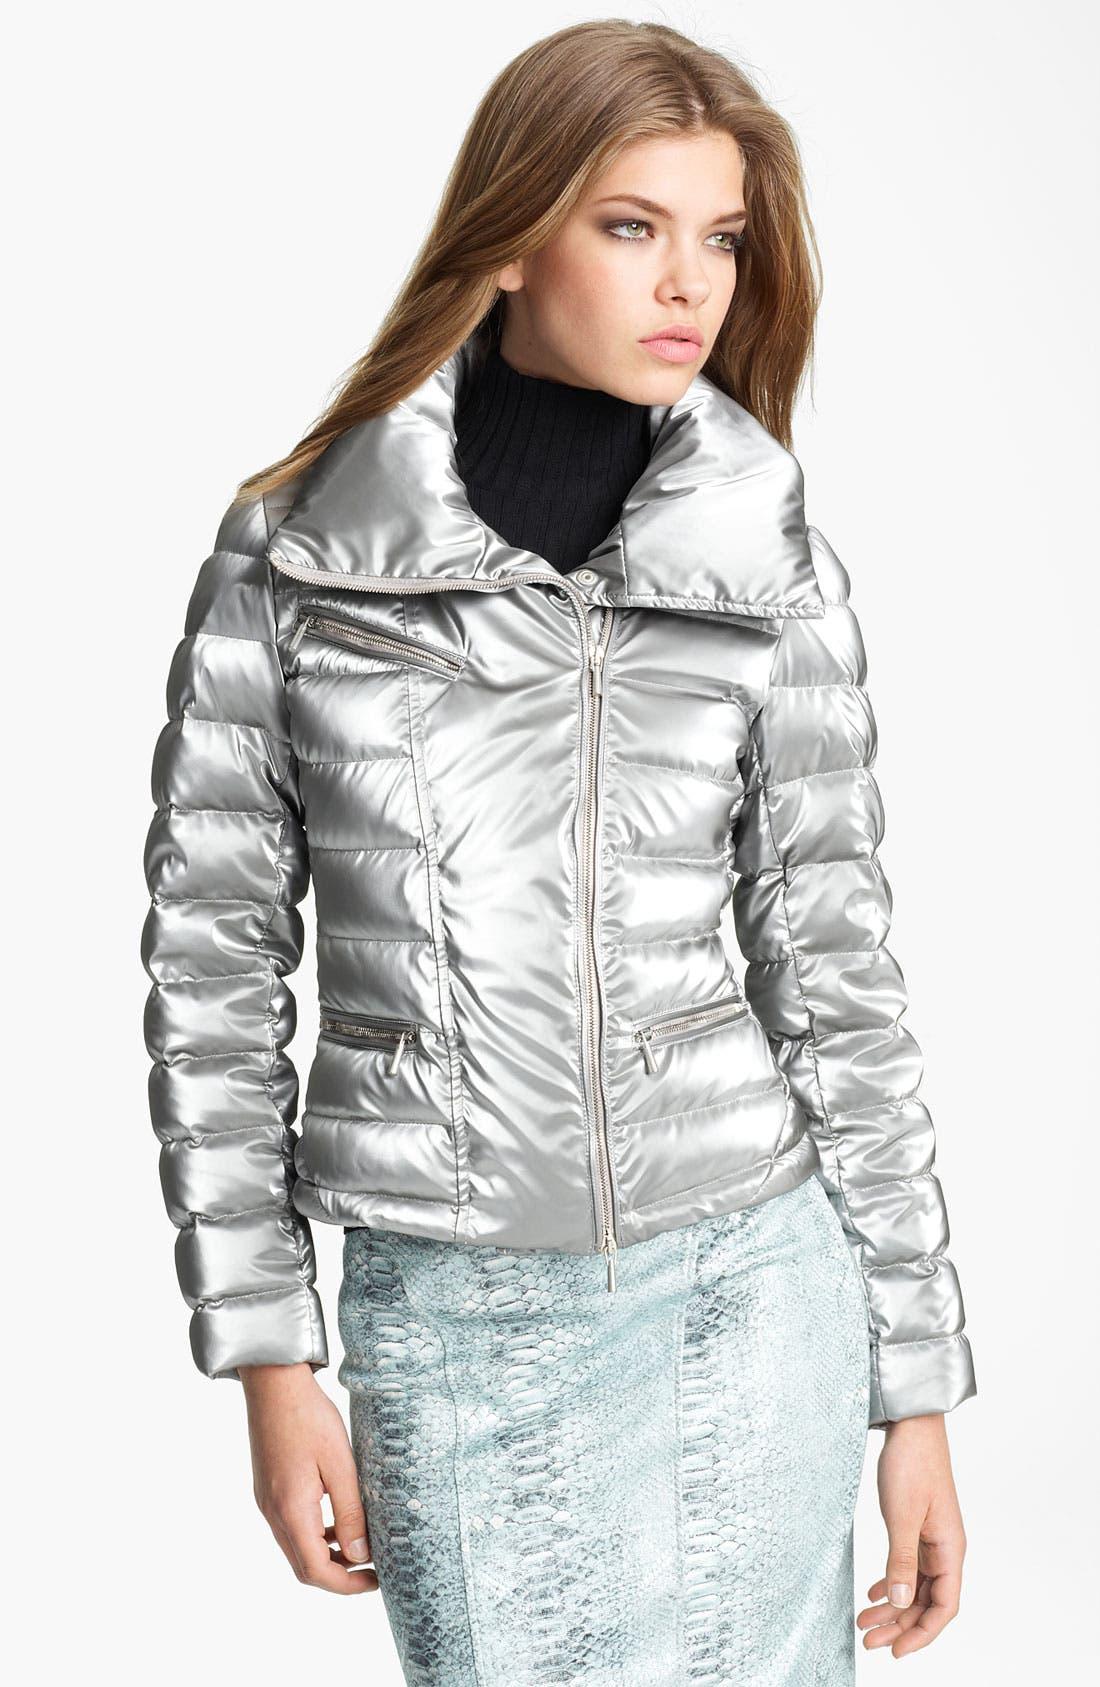 Blumarine Asymmetrical Puffer Jacket Nordstrom